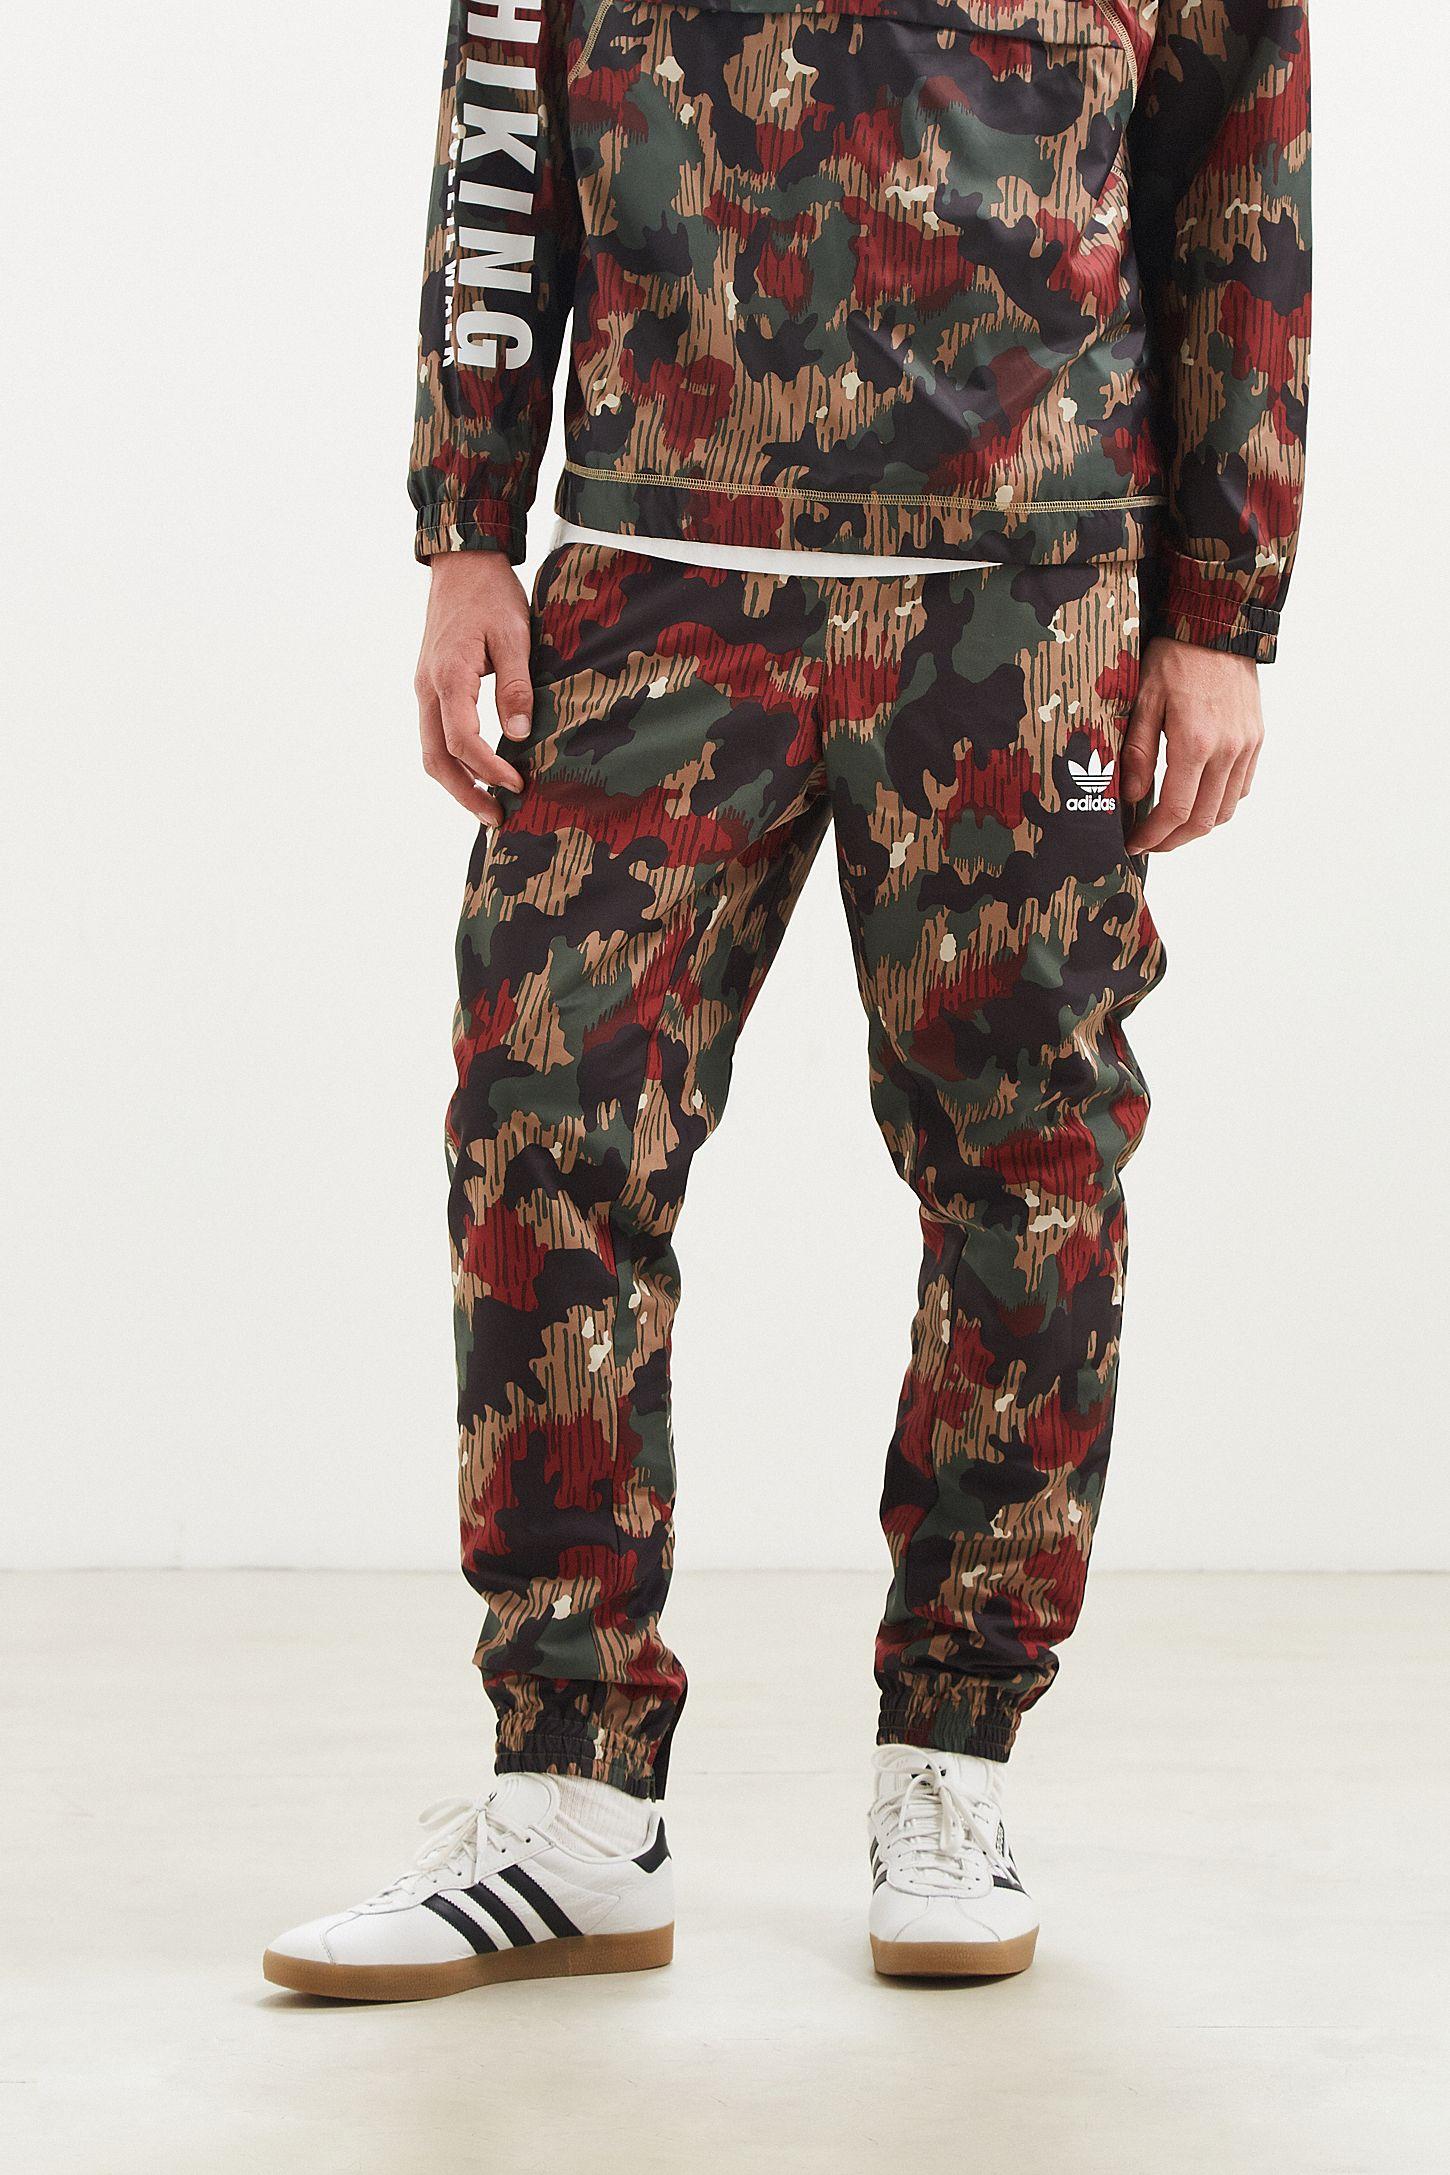 a034600c1 adidas X Pharrell Williams Hu Hiking Camo Wind Pant